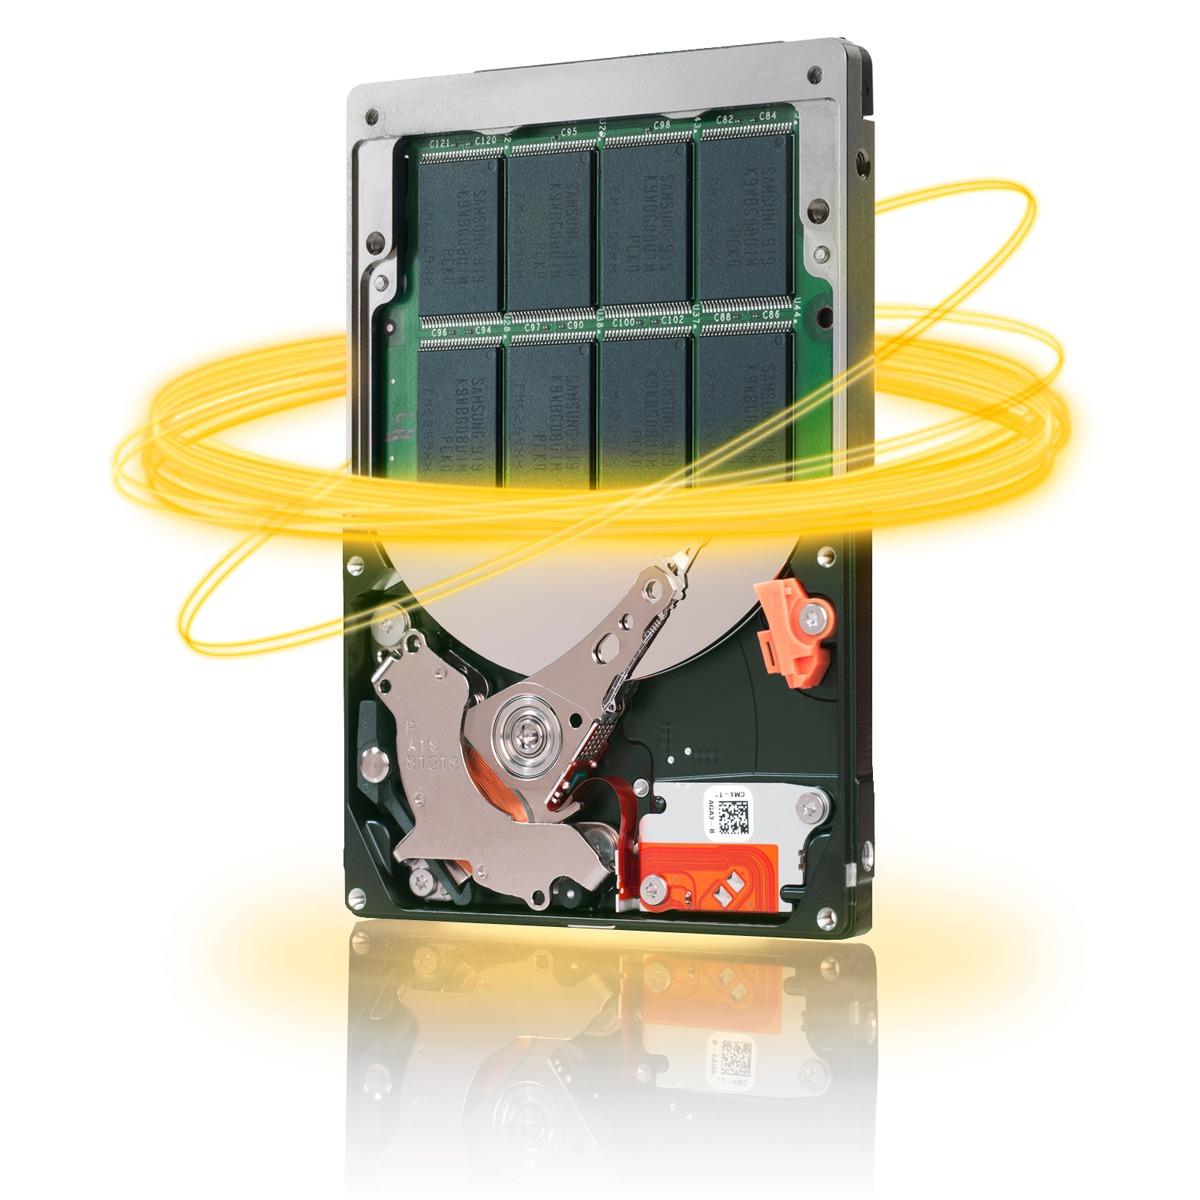 "Disque dur interne Seagate Momentus XT Hybrid SSD 750 Go NAND Flash SLC 8 Go Disque dur Hybride SSD 2.5"" 7200 RPM 32 Mo Serial ATA 6Gbits/s (bulk)"